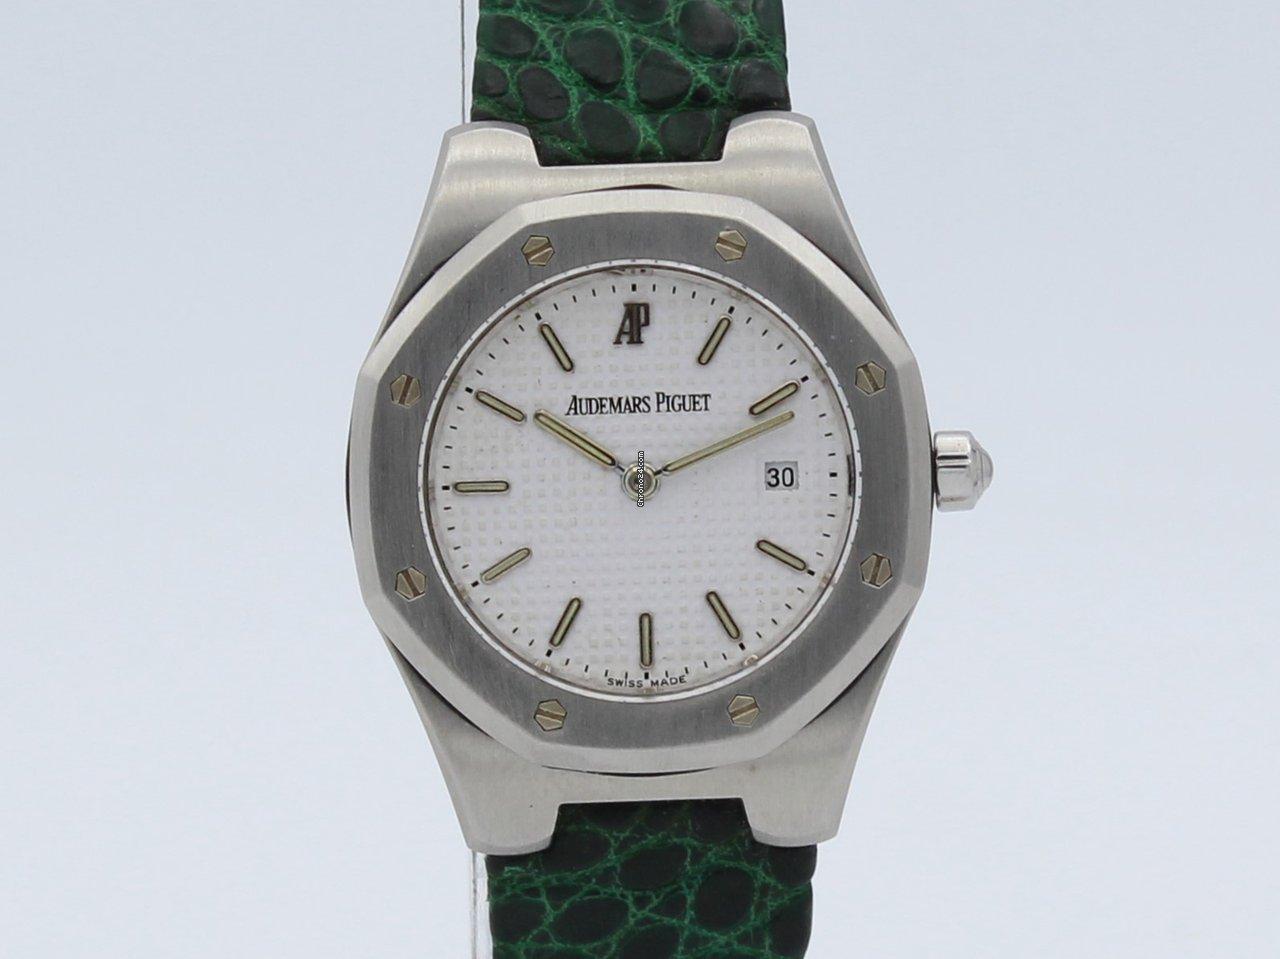 cb28d7d428f3 Precios de relojes Audemars Piguet mujer